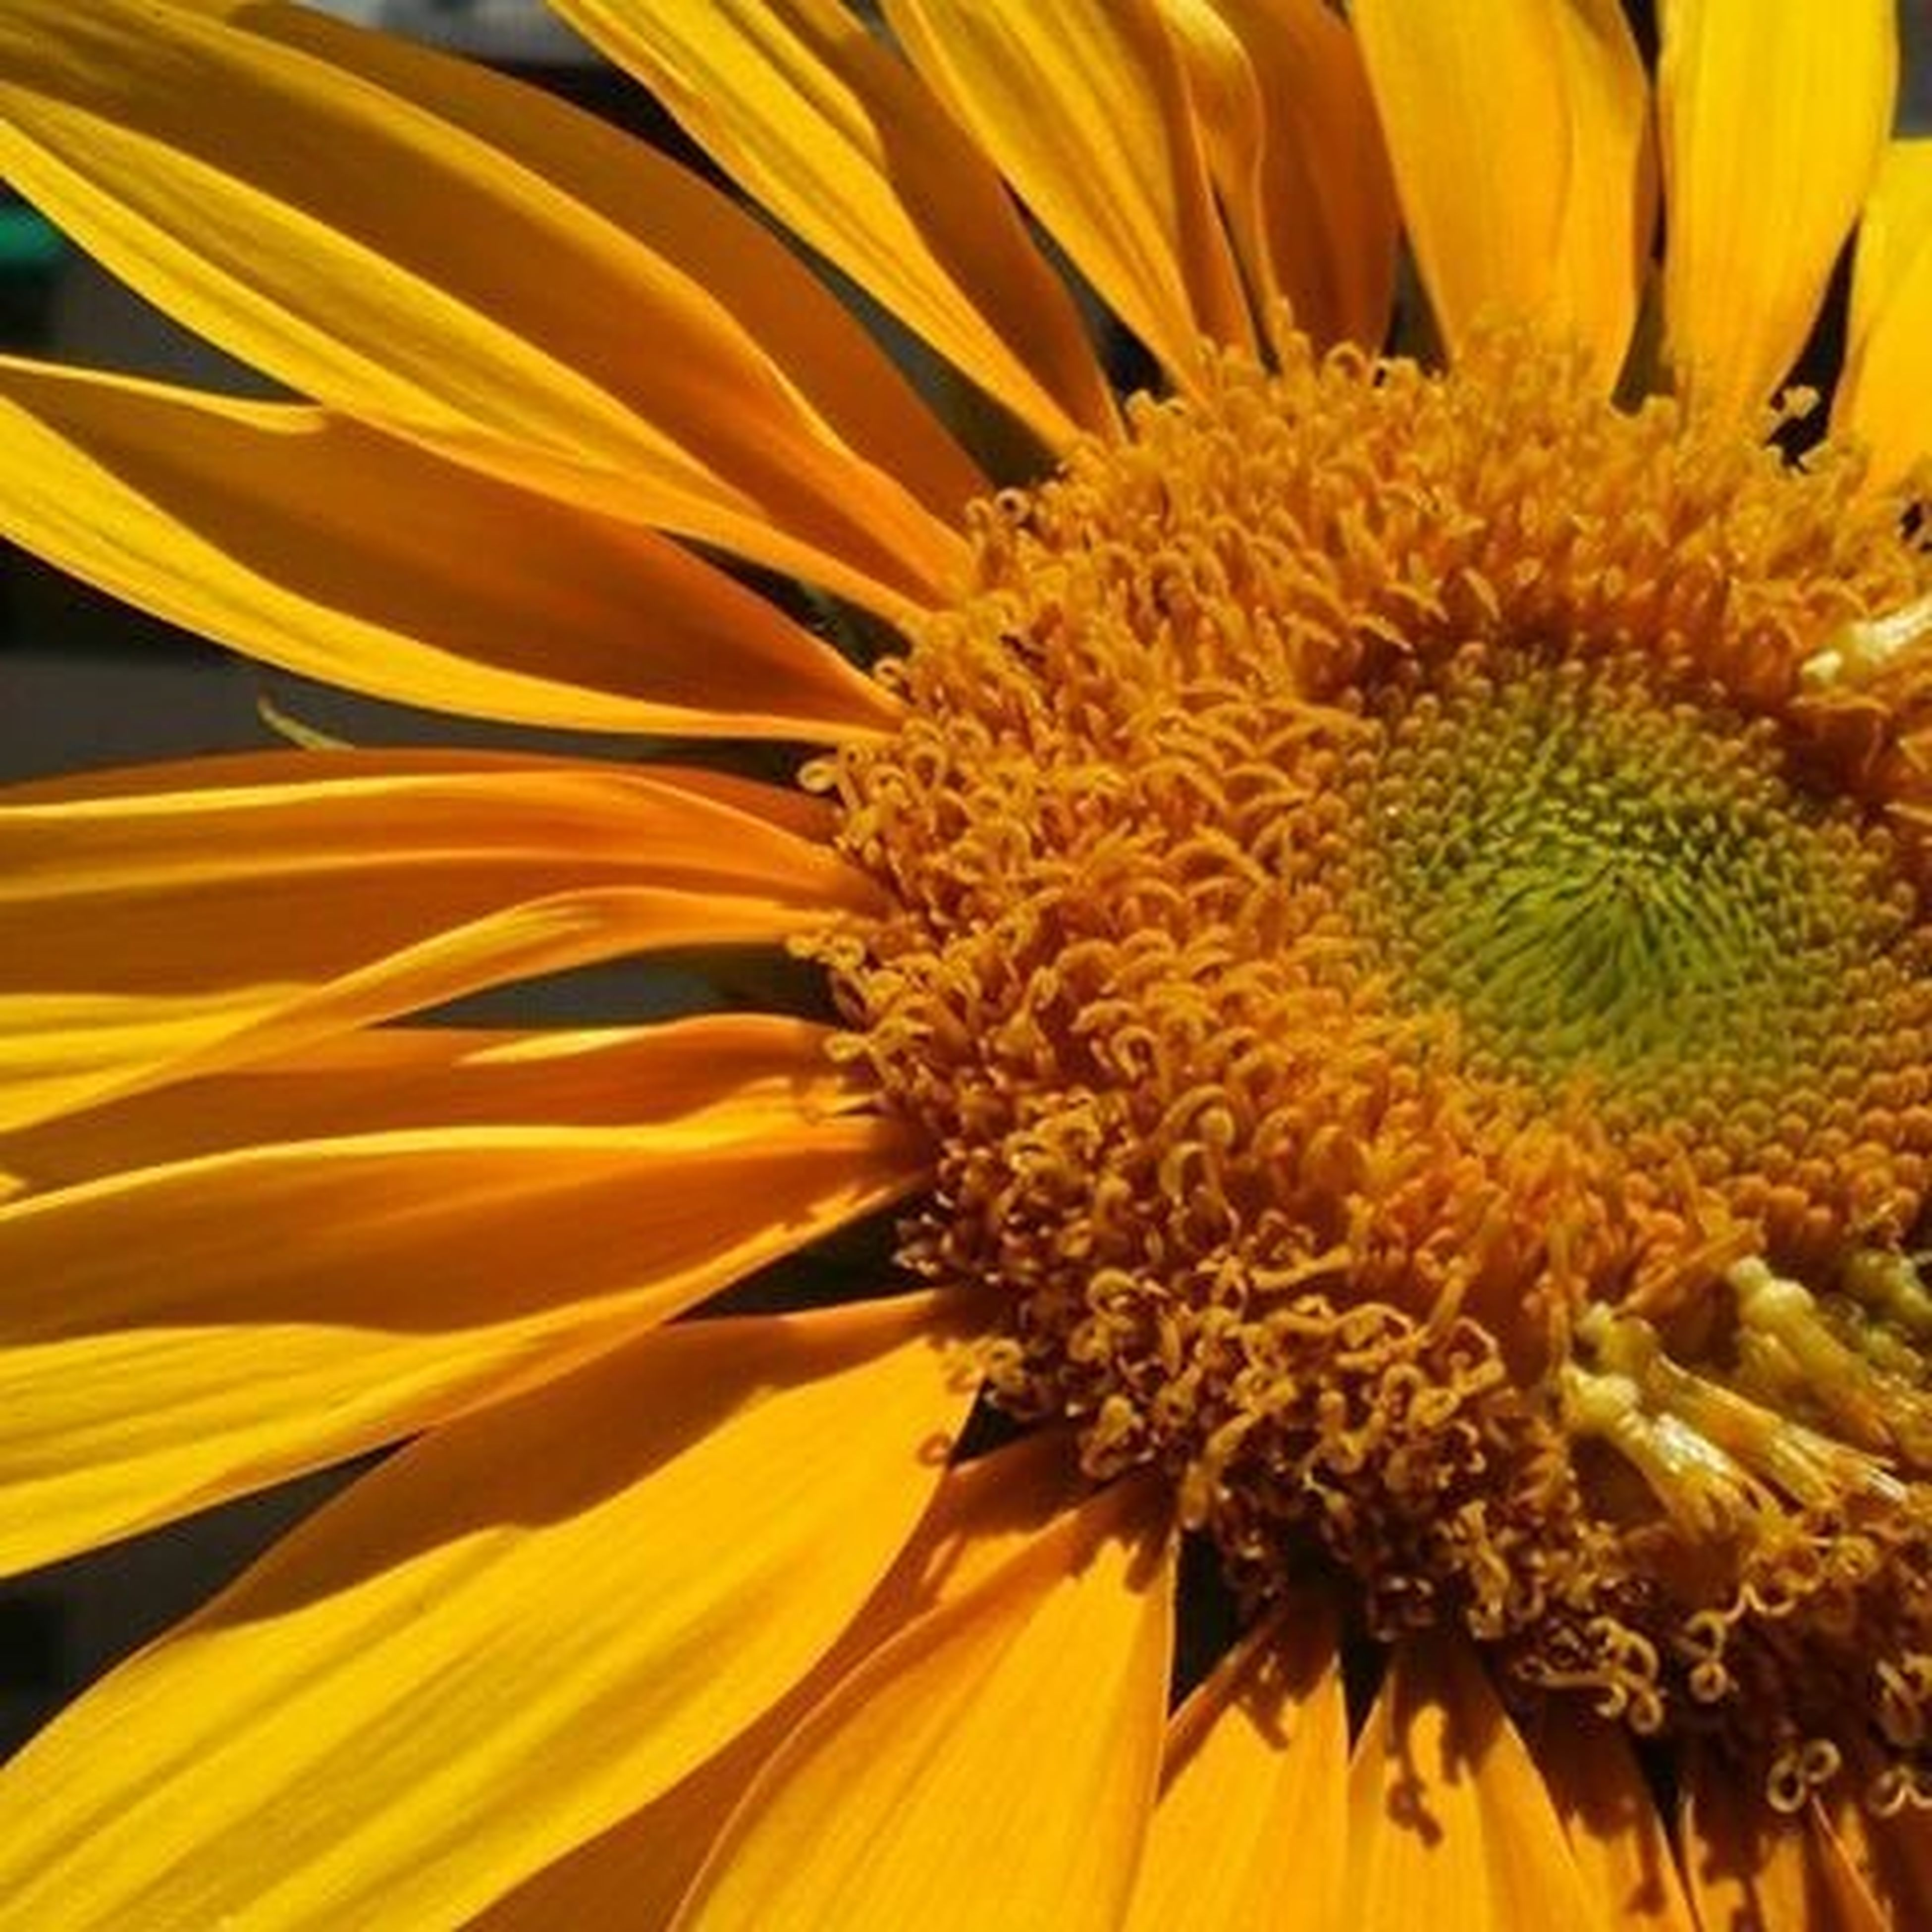 Myautobiography Like4like Flowerslike Naturelive Naturelike